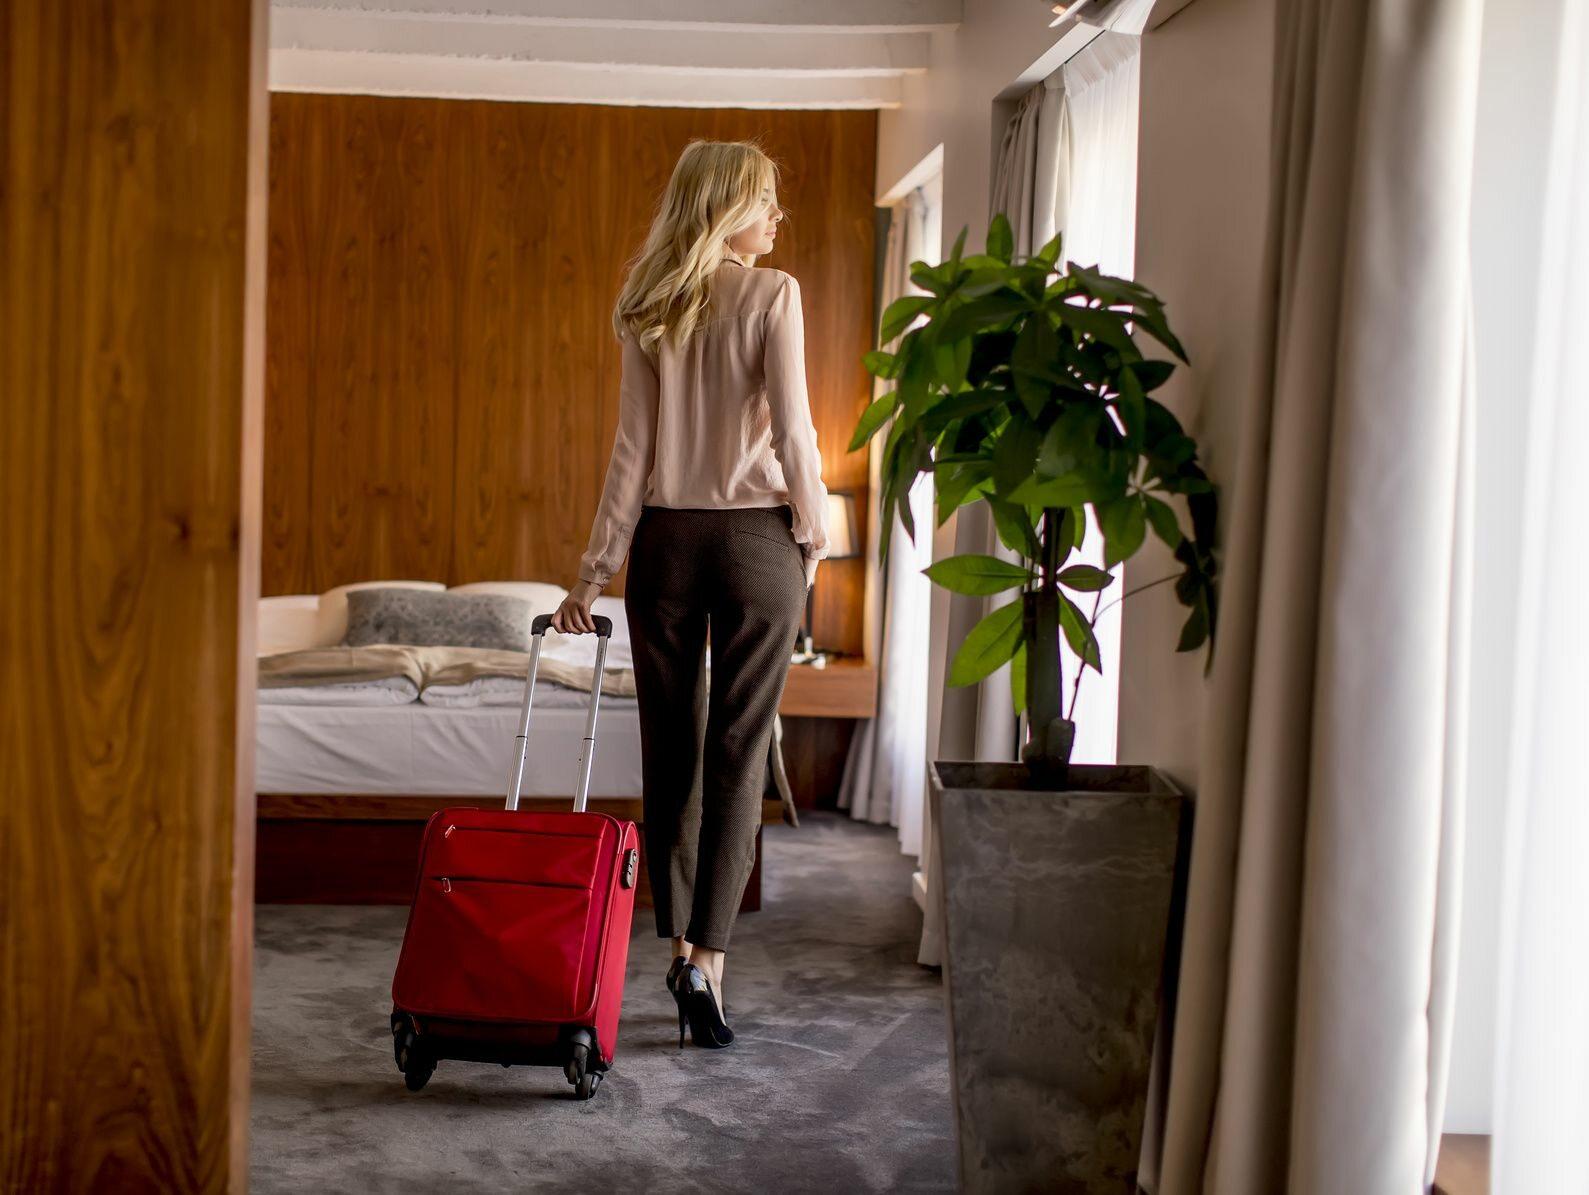 Hotel, zdj. ilustracyjne